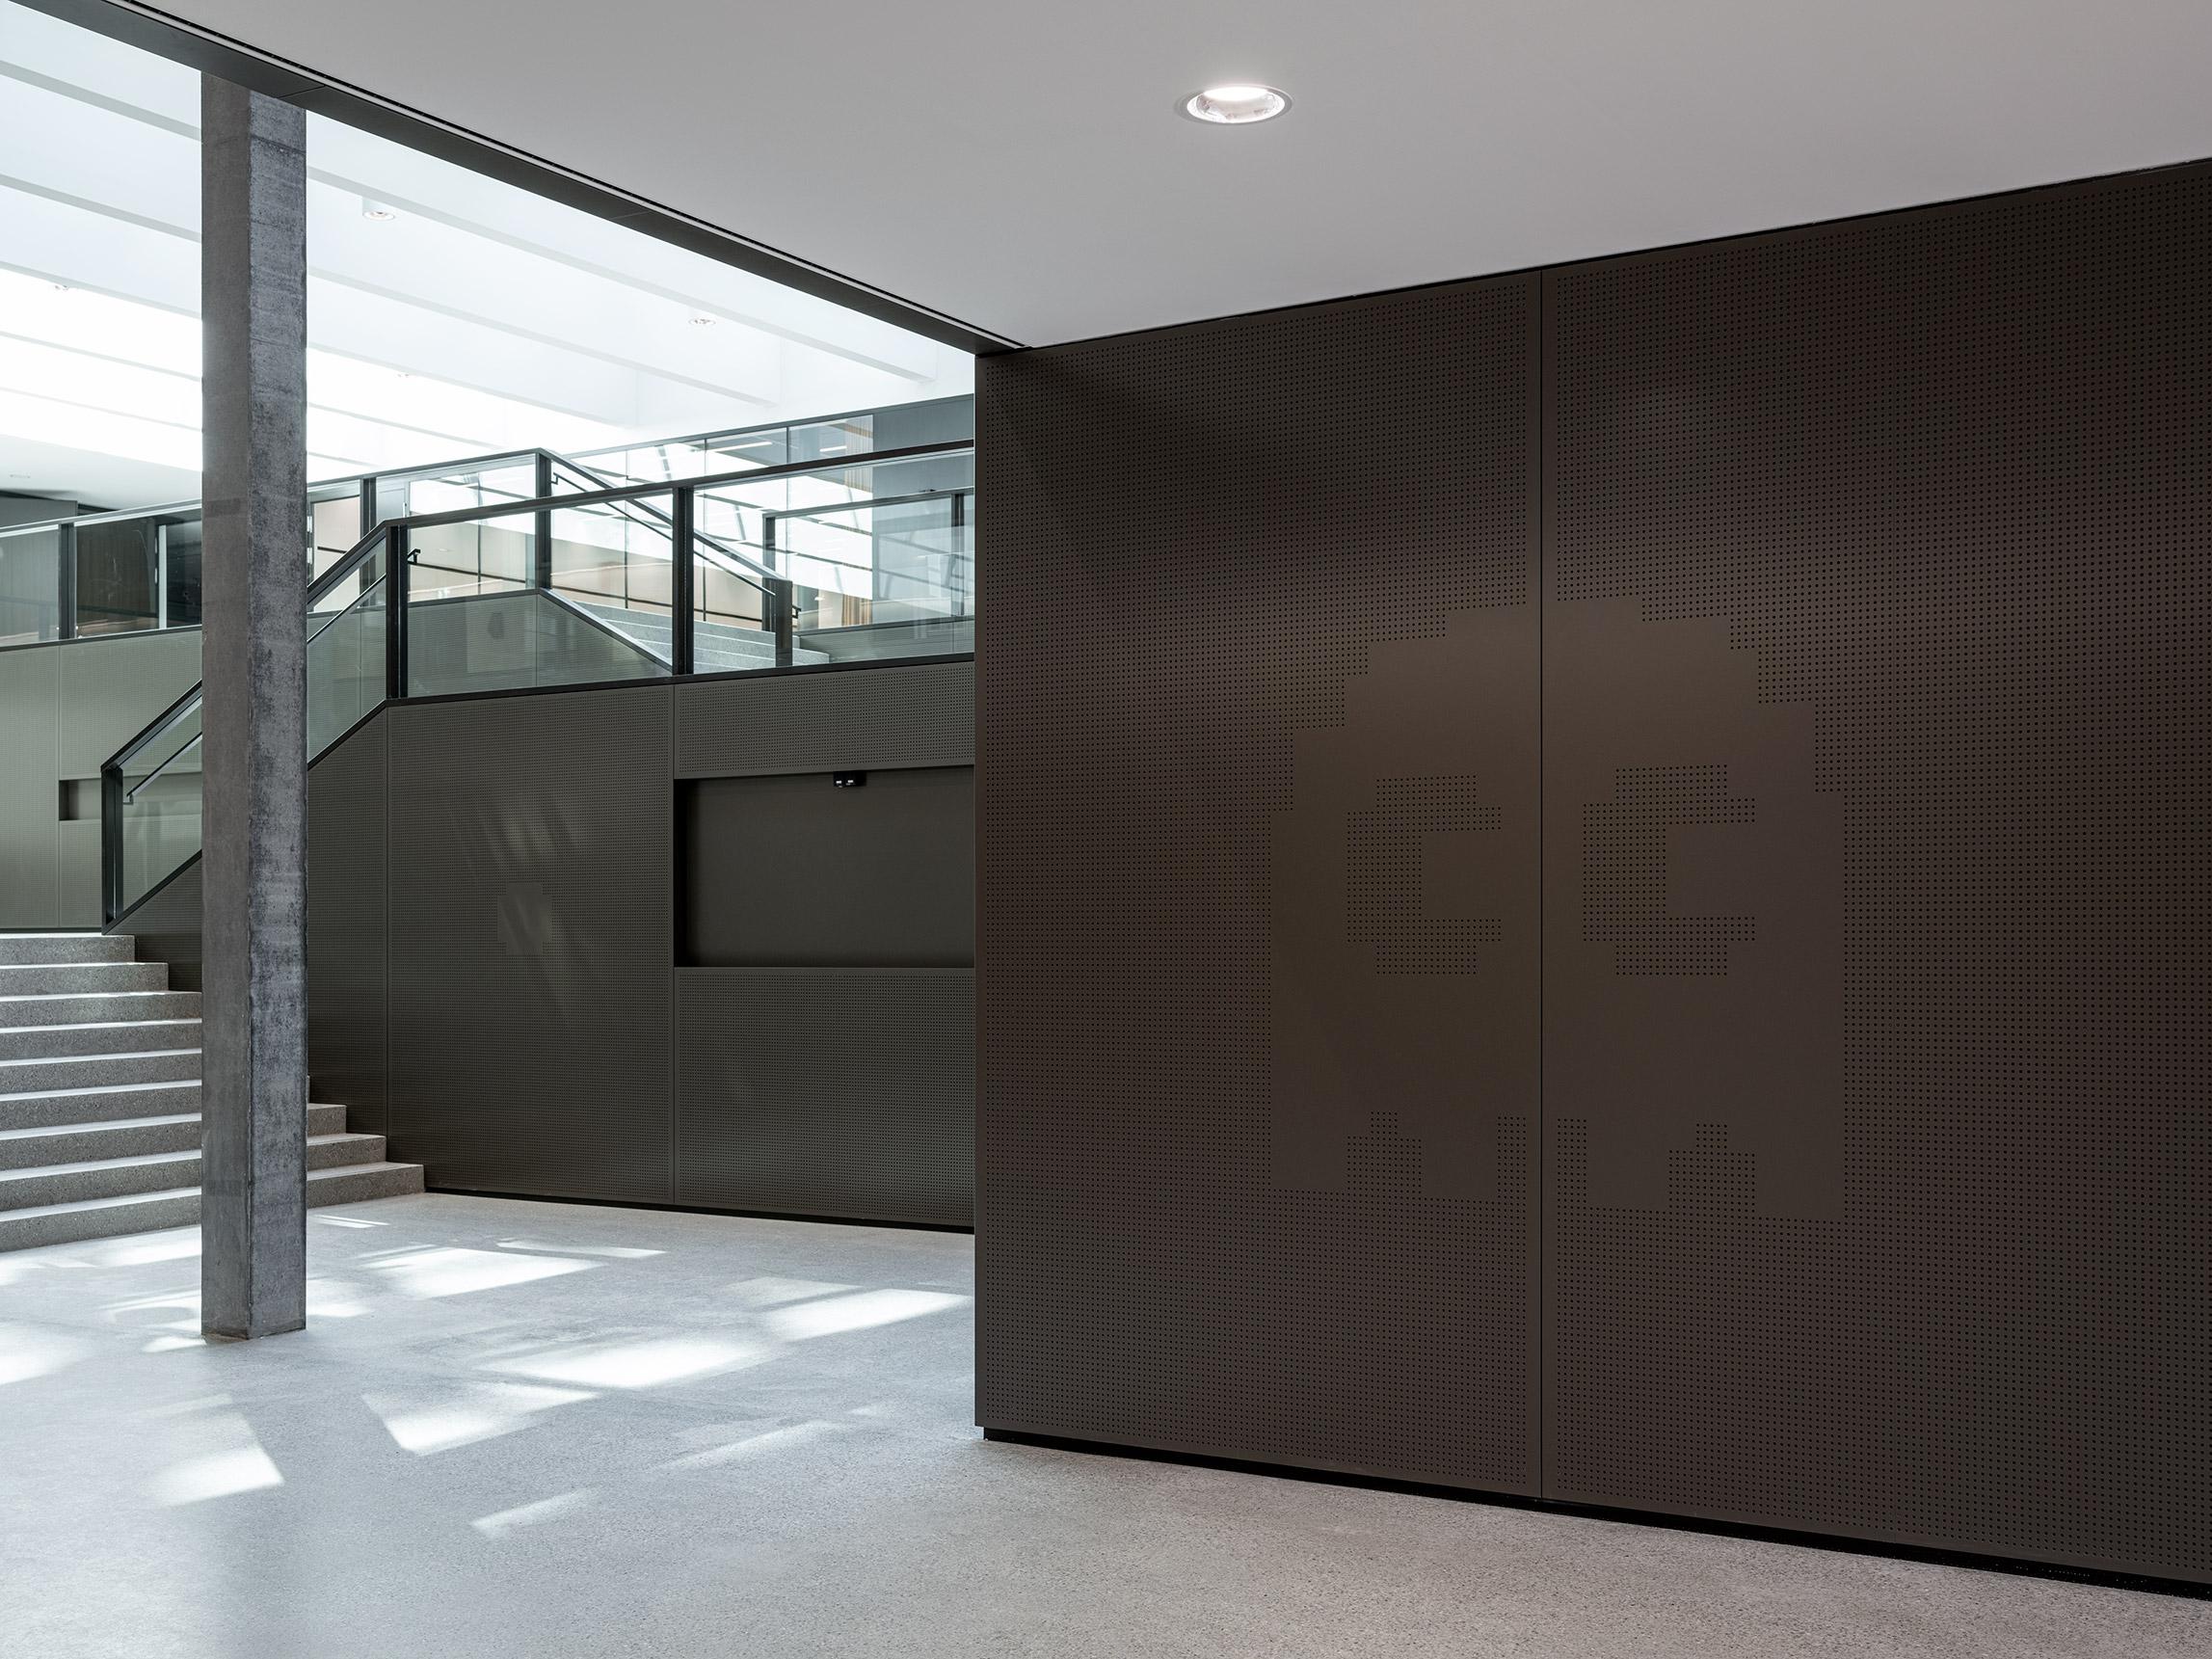 Signaletik Retro Icon Foyer Architektur am Eichenweg 3, BIT, Zollikofen Bern